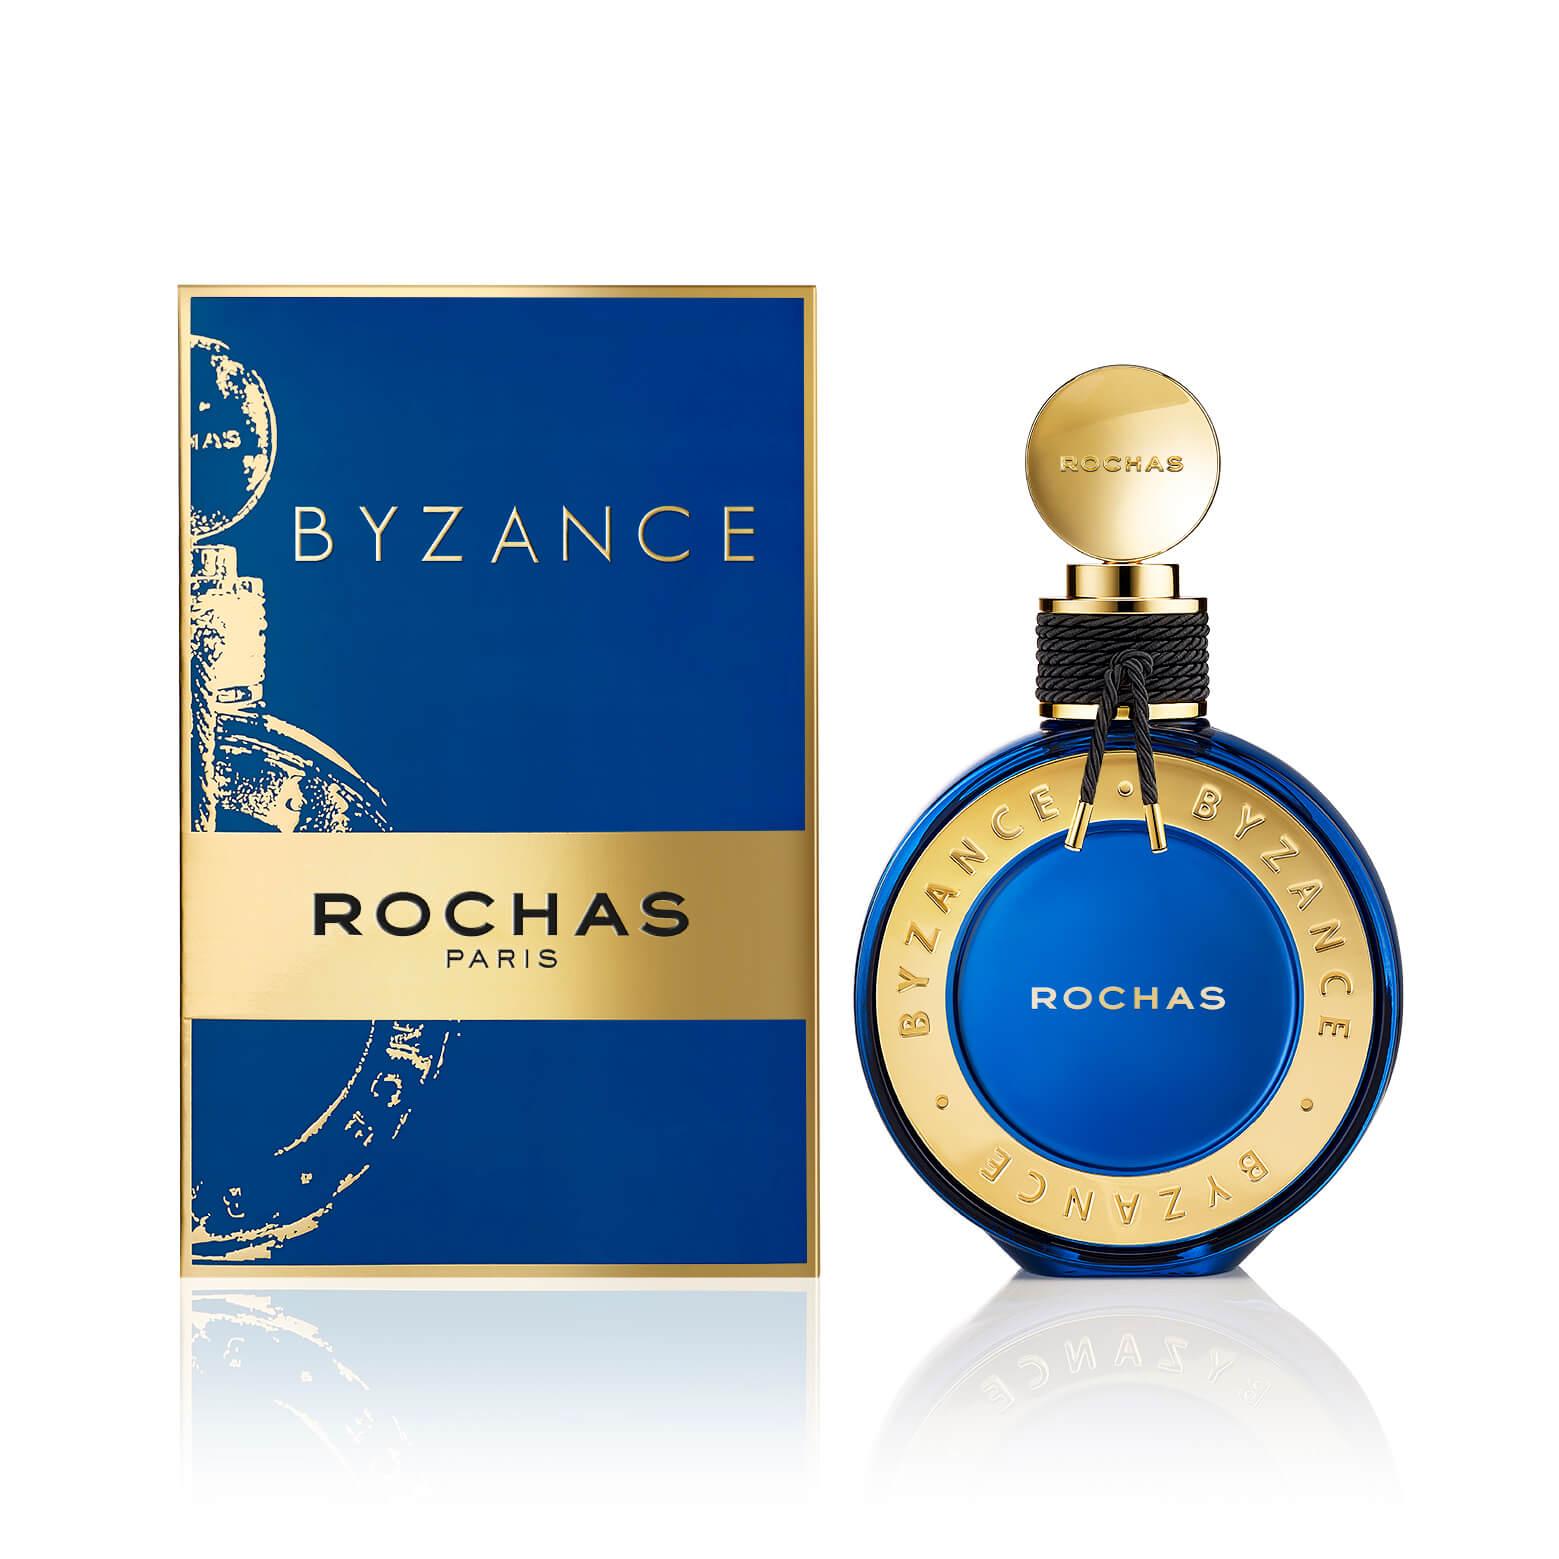 Byzance Rochas